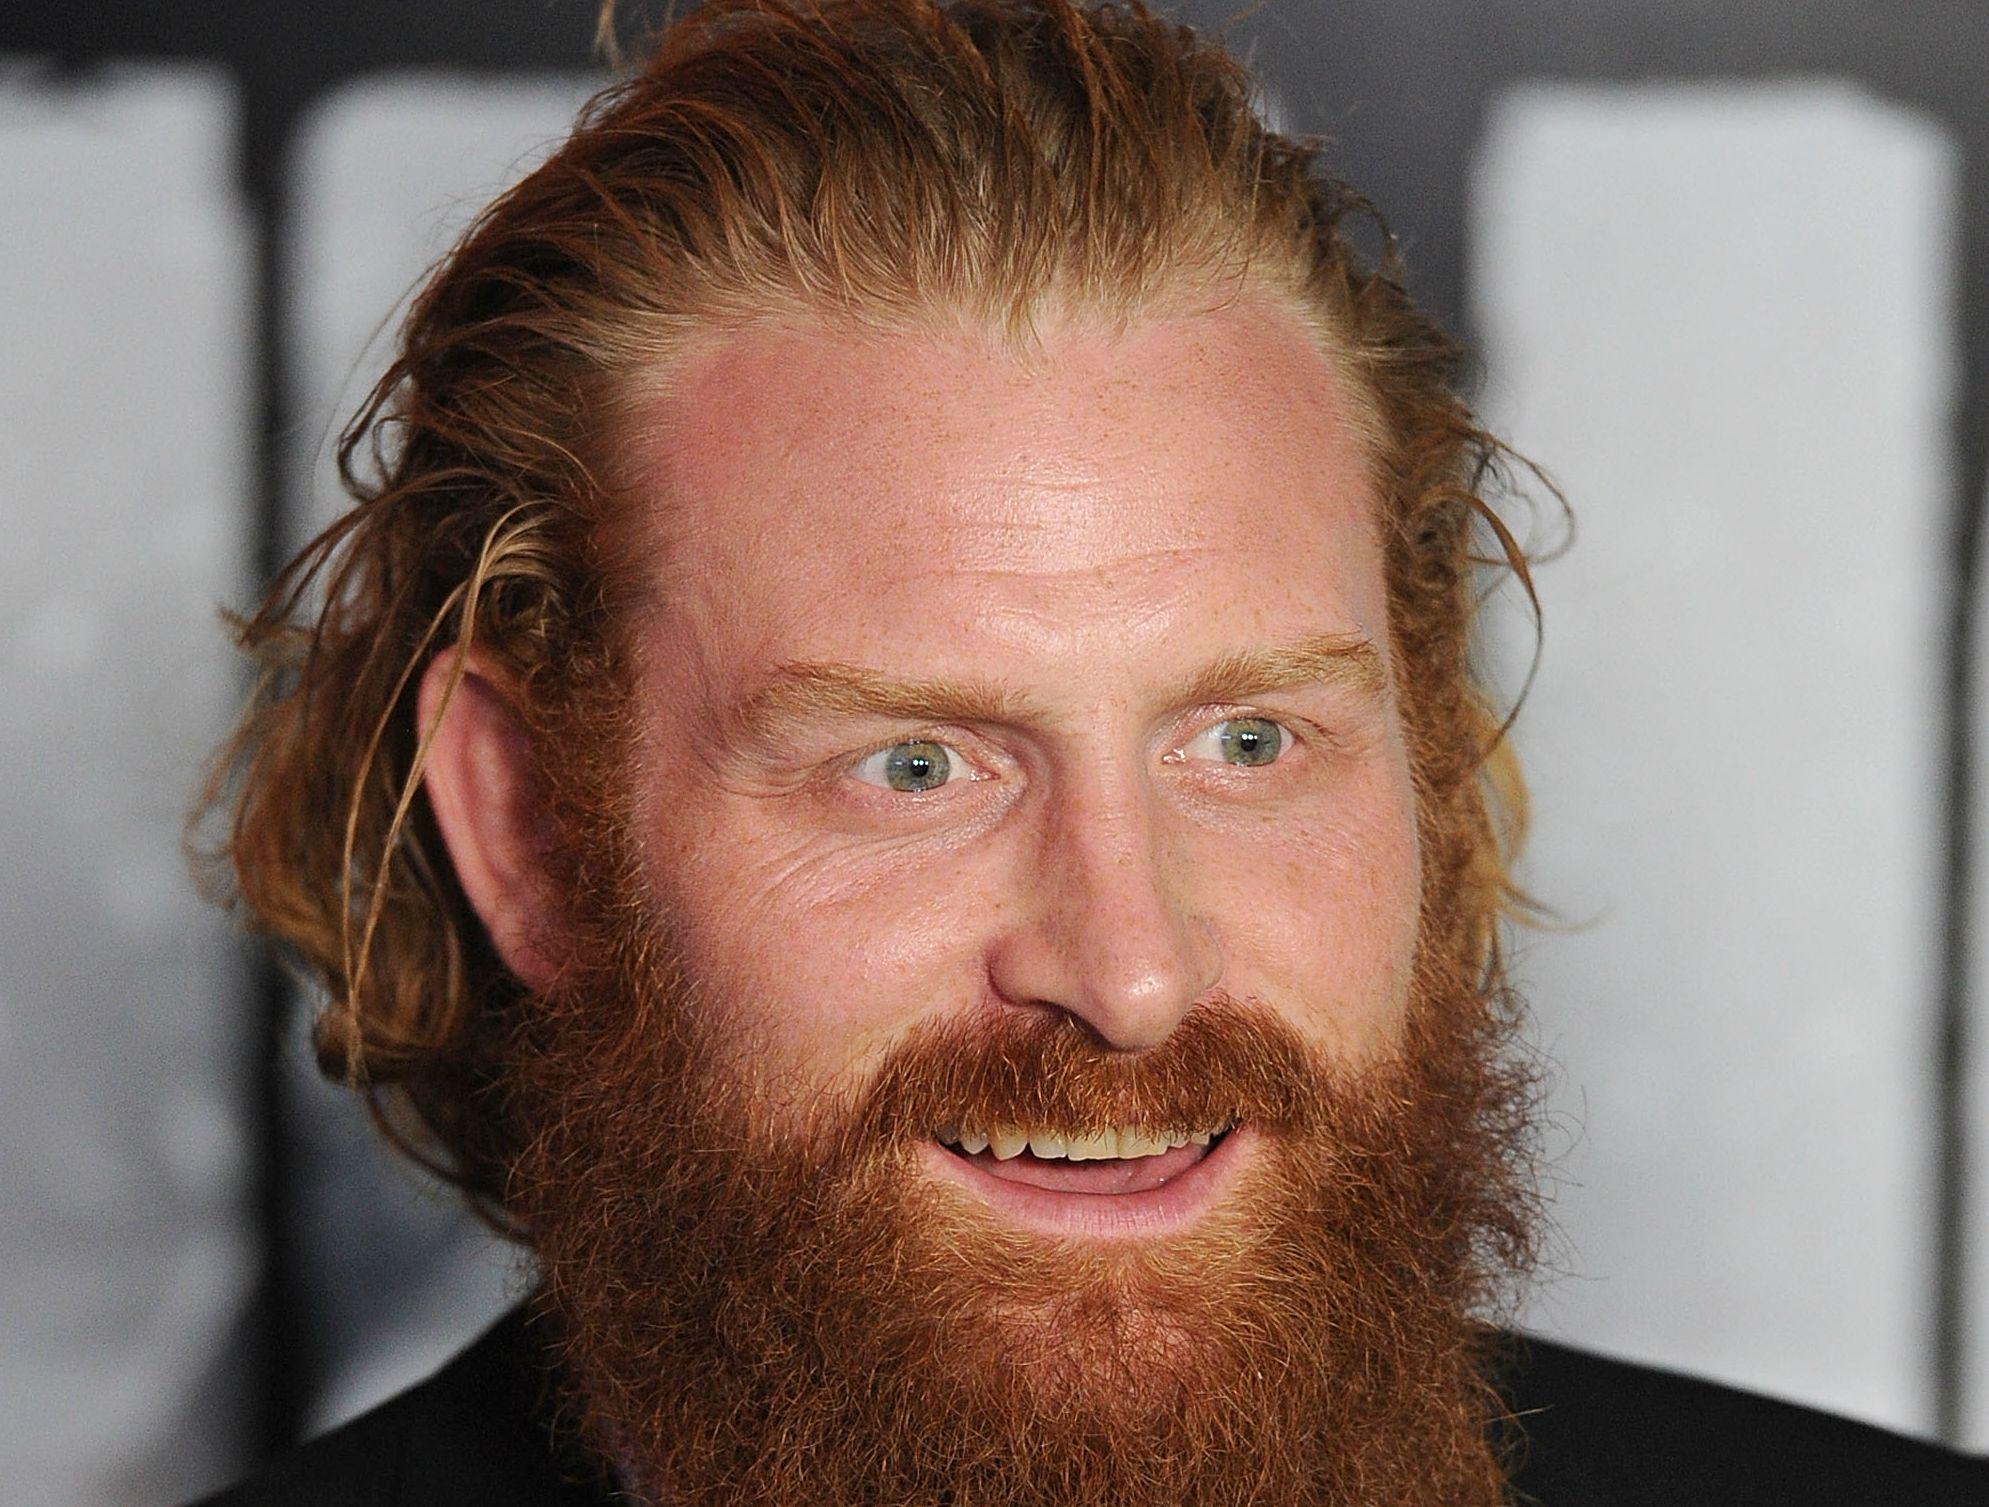 Kristofer Hivju from Game of Thrones